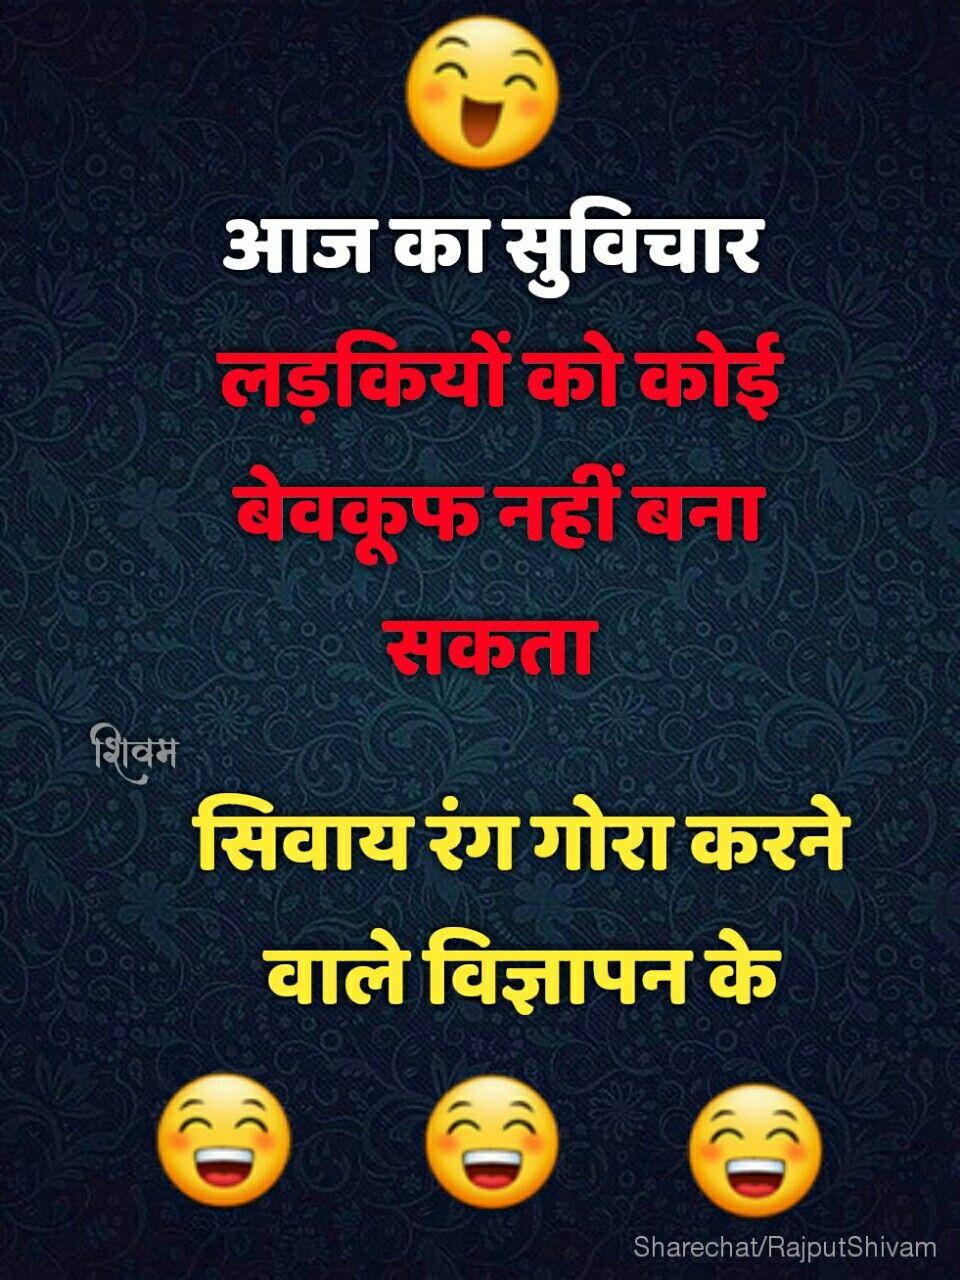 Pin By Ravi Raj On Jokes Some Funny Jokes Wife Jokes Funny Messages